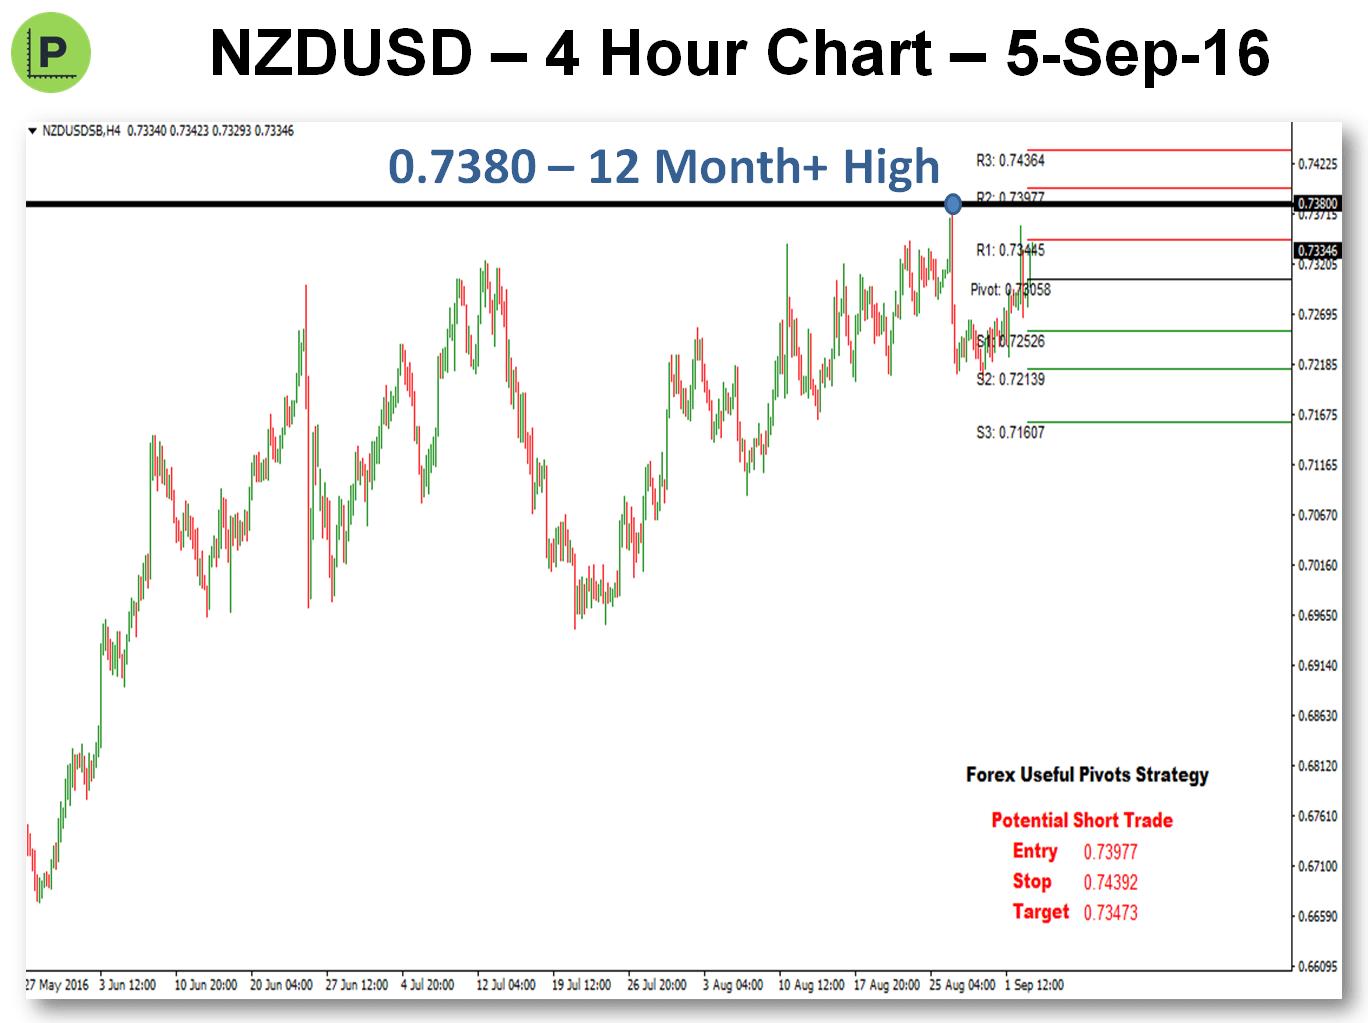 Potential Pivot Trade - 5-Sep-16 NZDUSD